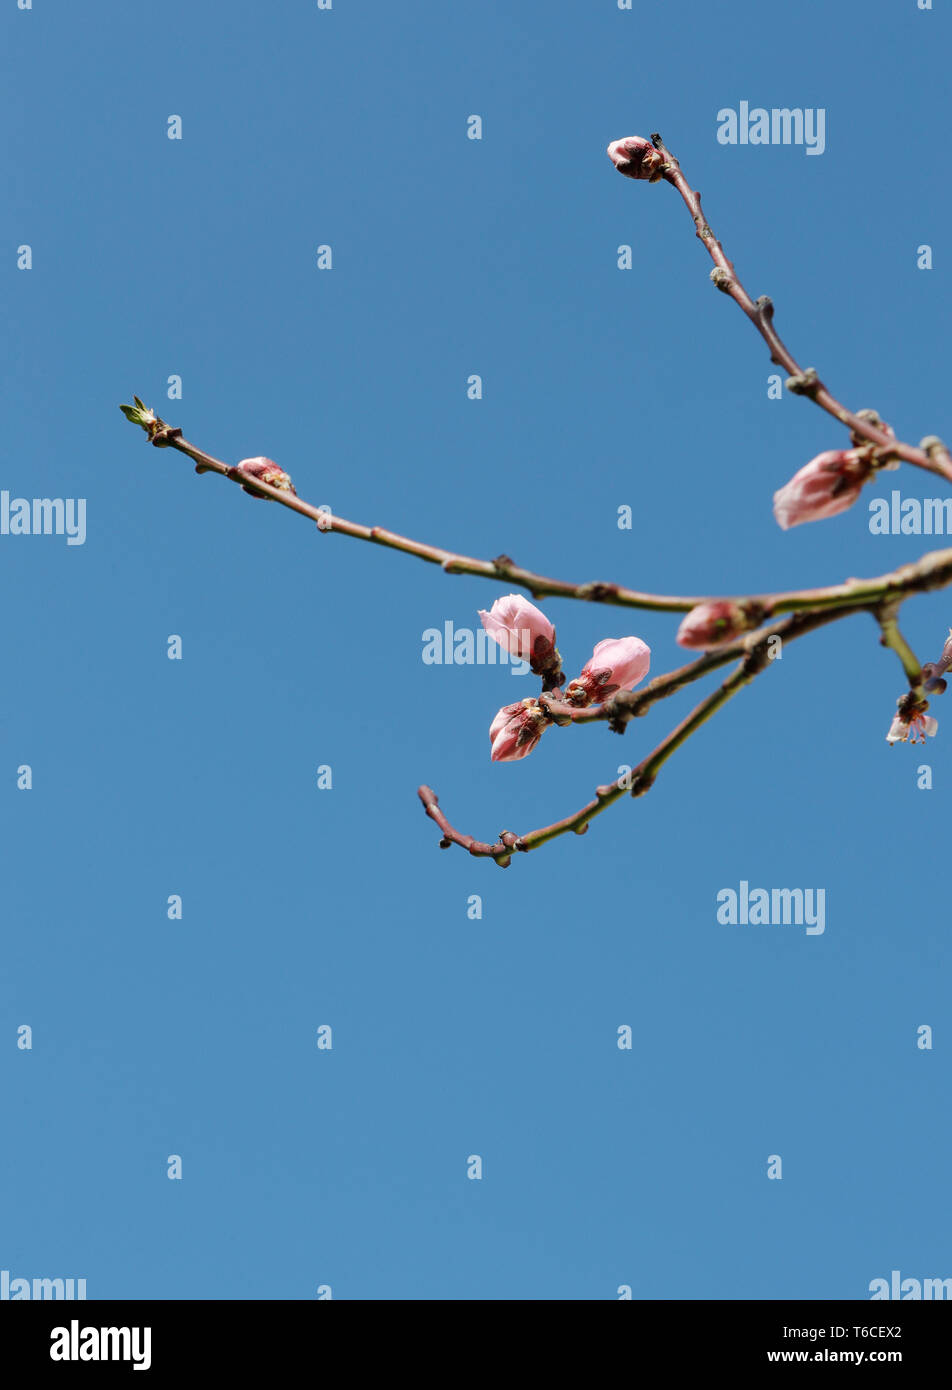 Peach (Prunus persica), peach flowers against blue sky. France - Stock Image